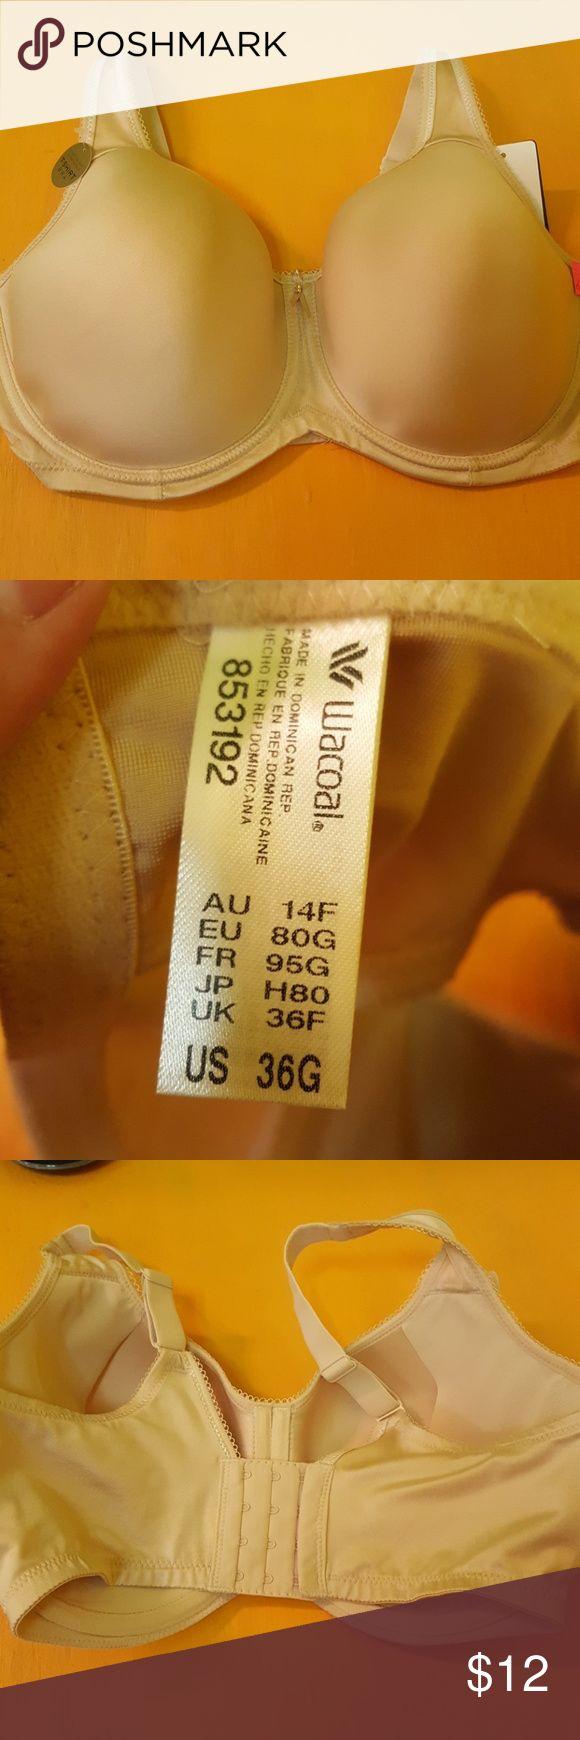 NWT Women's Wacoal bra 36 G tan New with tags Wacoal bra size 36G Wacoal Intimates & Sleepwear Bras